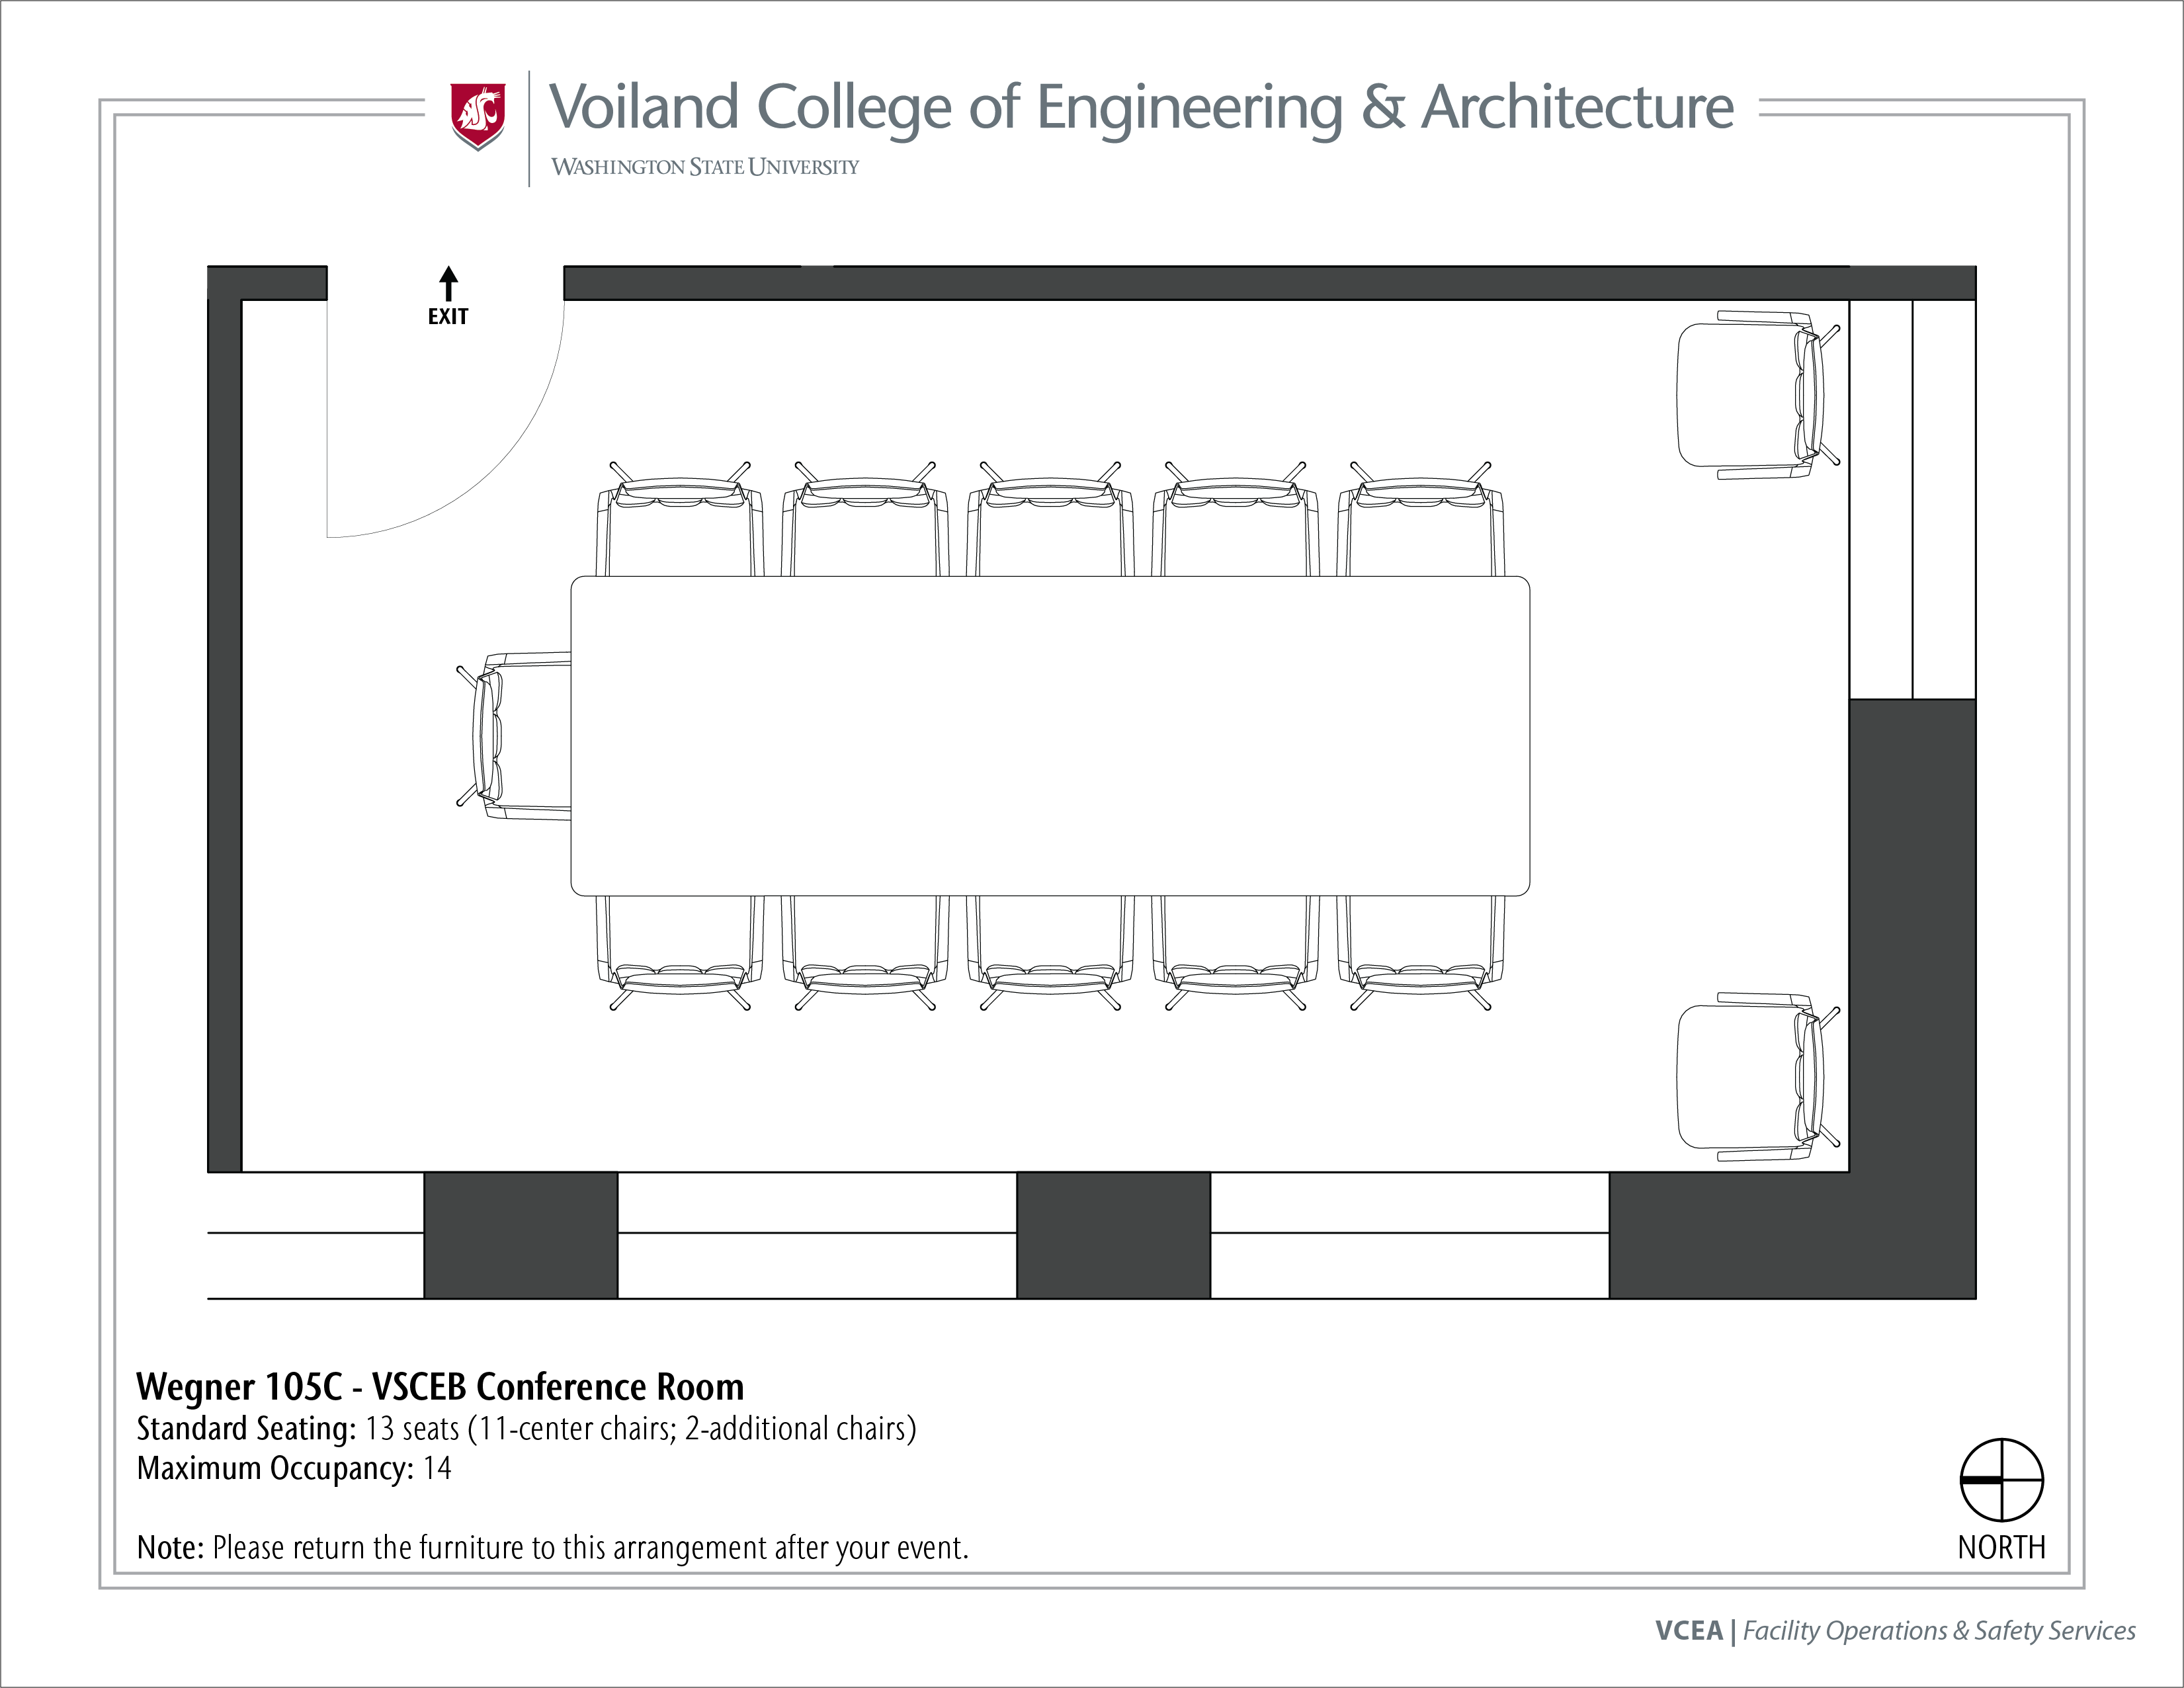 Layout of Wegner 105C, VSCEB Conference Room, at WSU Pullman